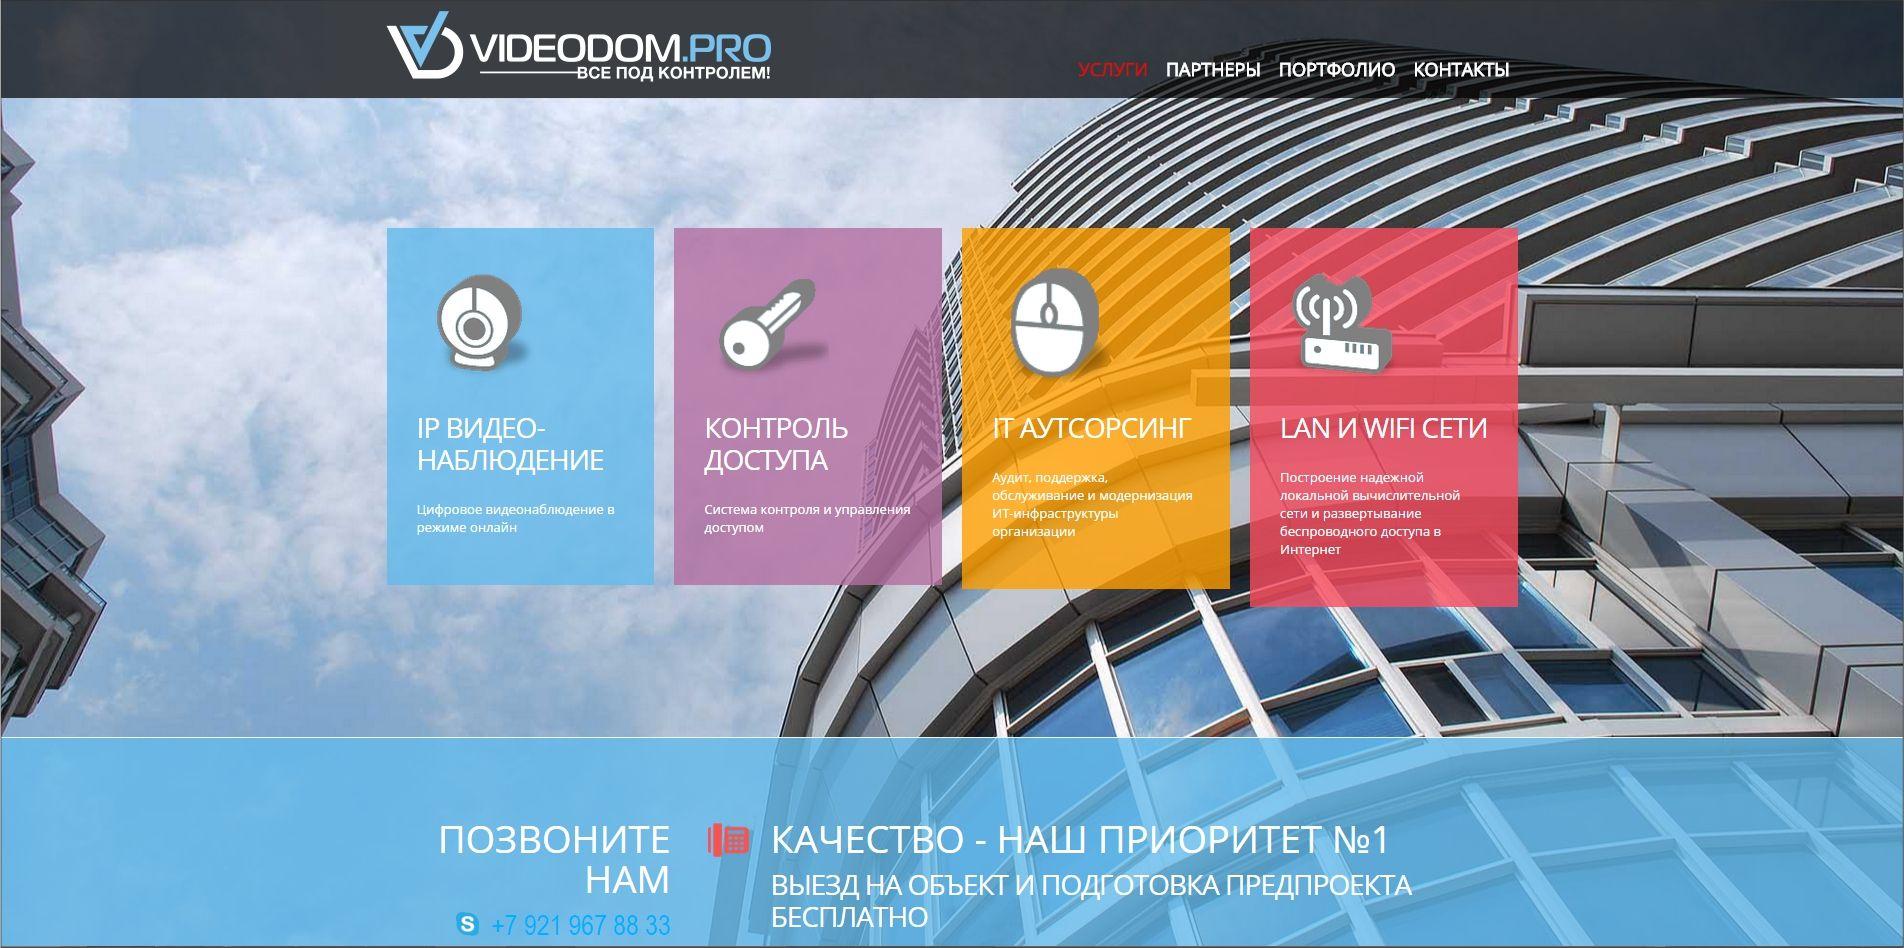 Логотип для videodom.pro - дизайнер robert3d